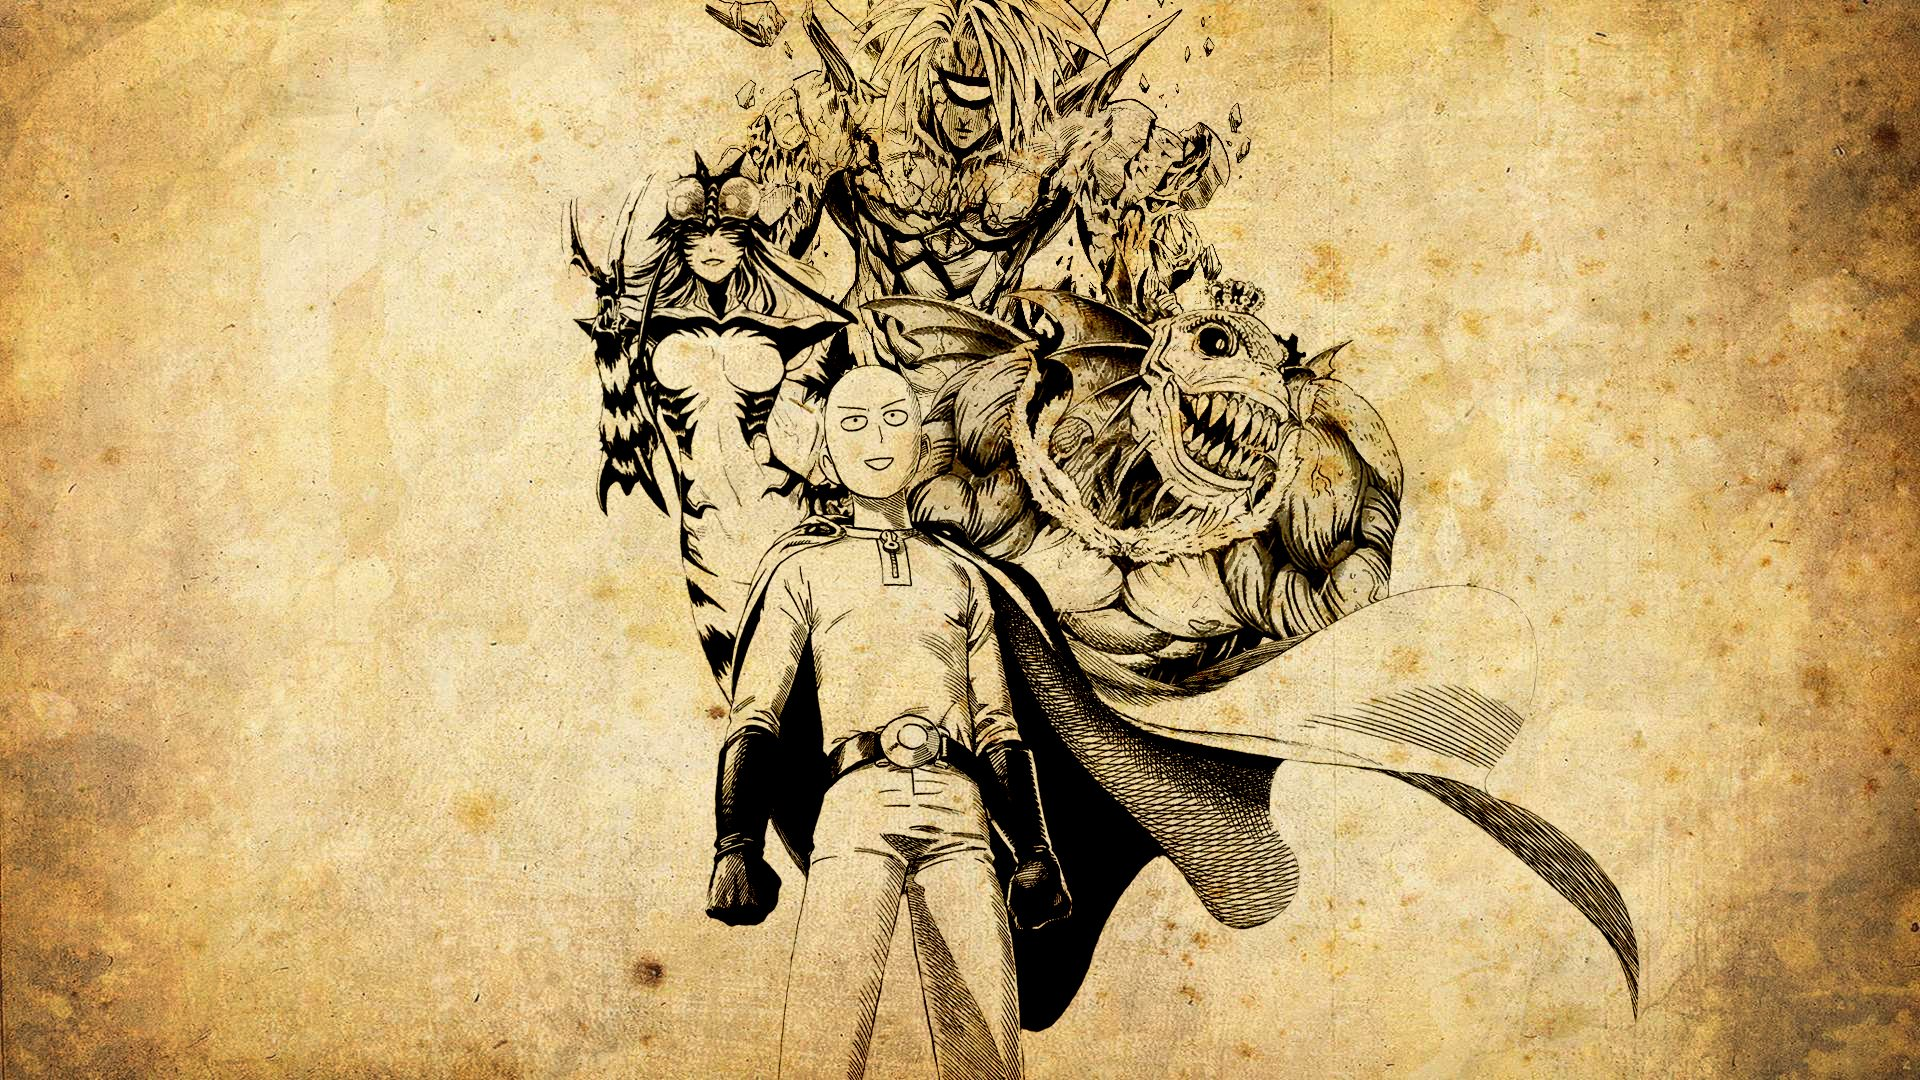 Аниме Ванпанчмен, One Punch Man - крутые обои на рабочий стол 14